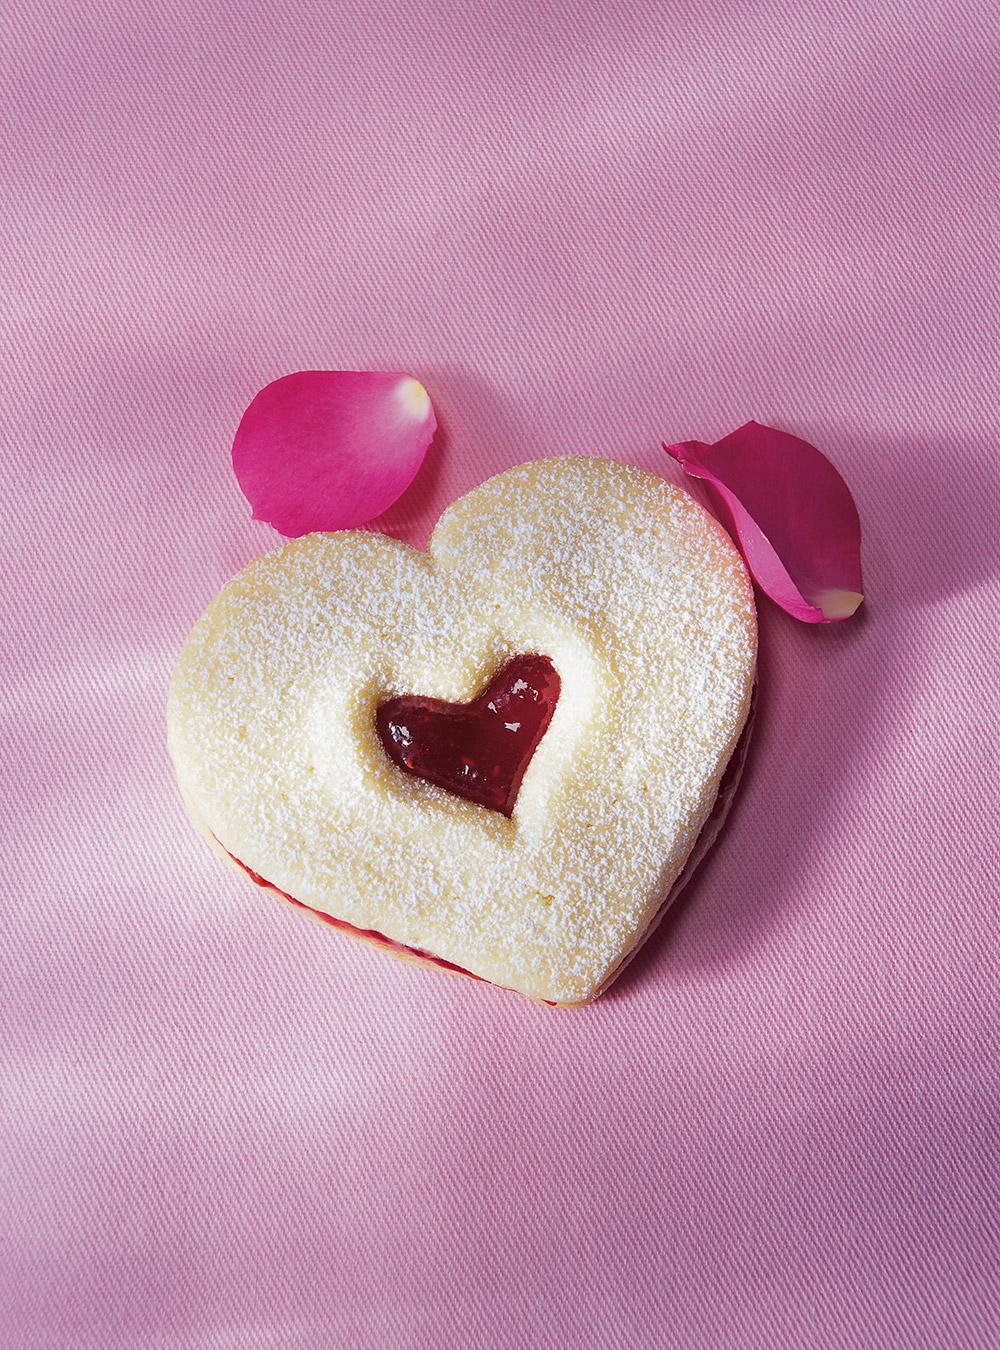 Biscuits à la confiture | ricardo